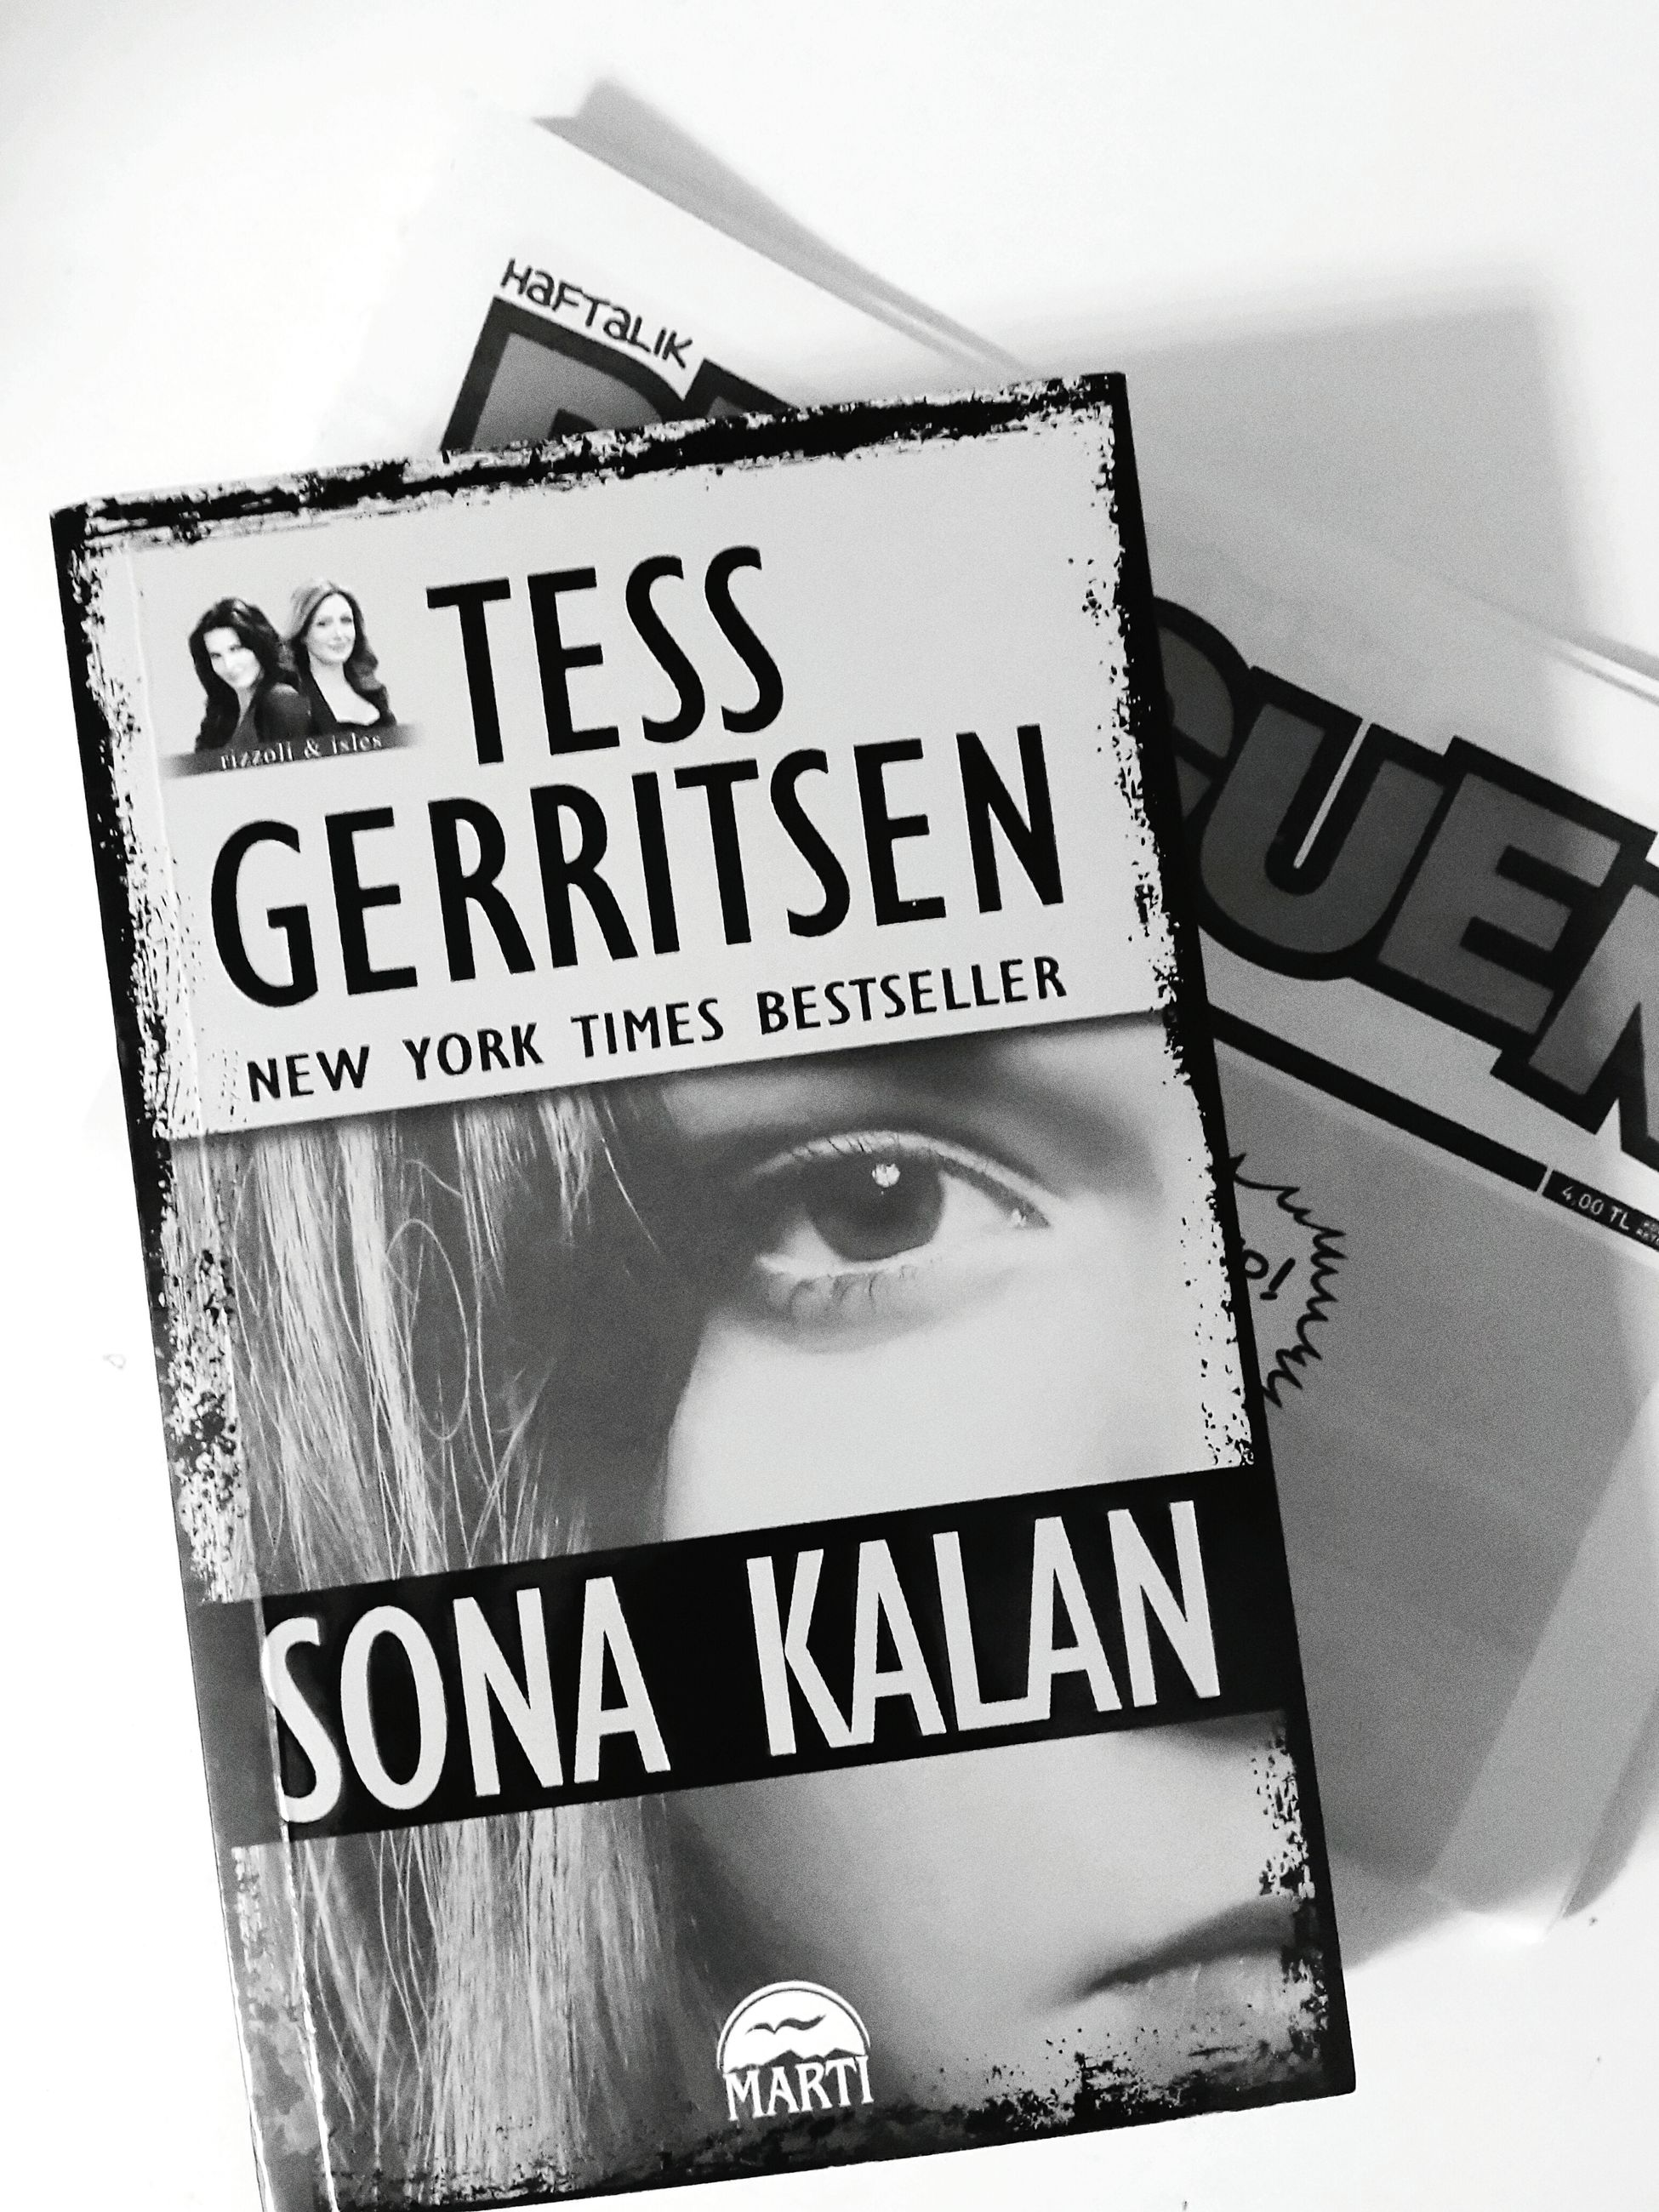 Tessgerritsen in Cerrah serisinin 9. Kitap Ini Okuyun ☺ Kitapsever Book Reading A Book